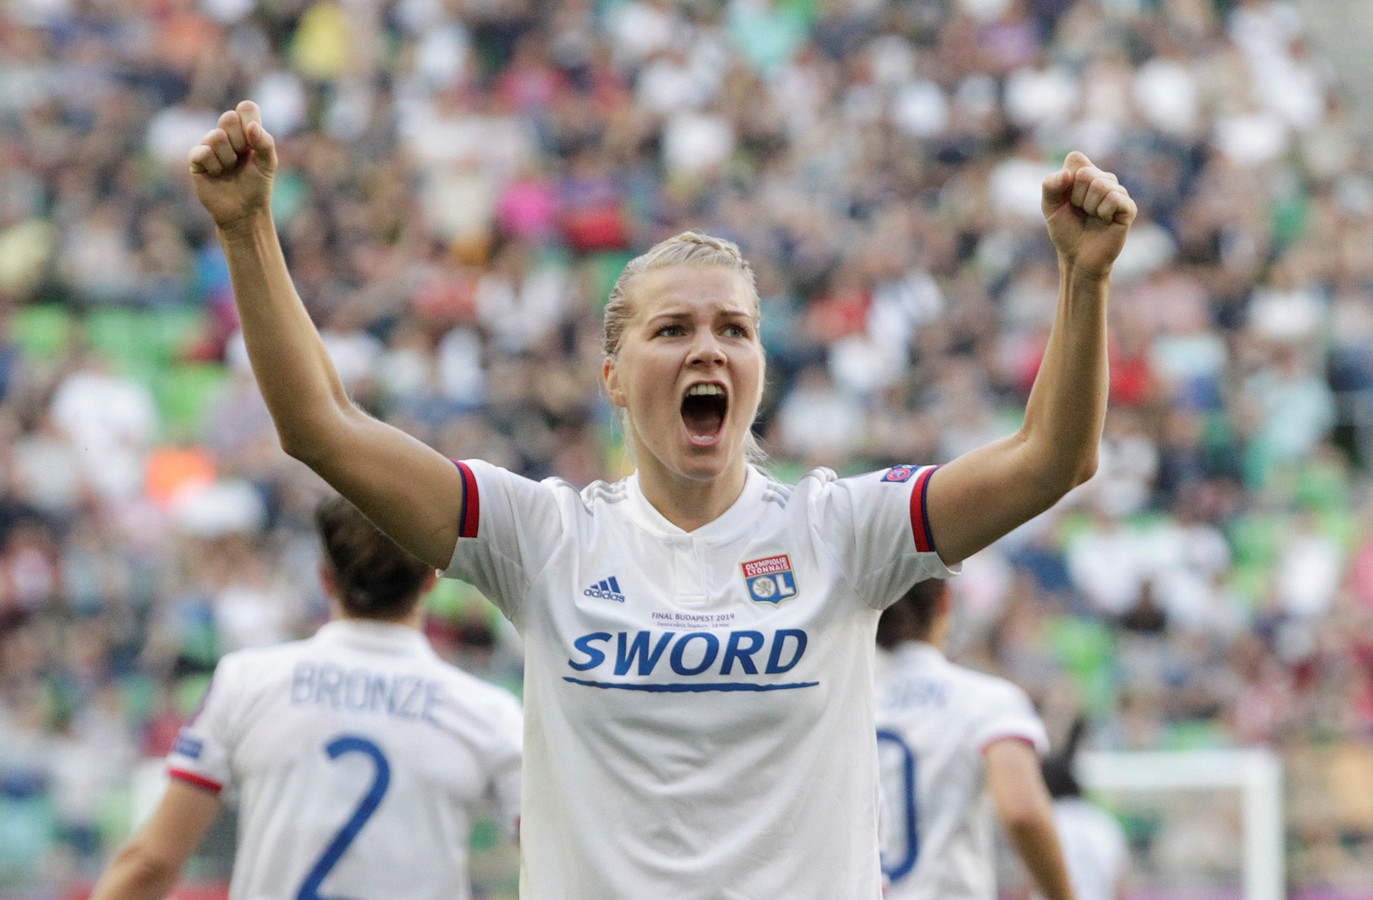 Ada Hegerberg juicht na haar derde goal in de Champions League-finale op 18 mei 2019.